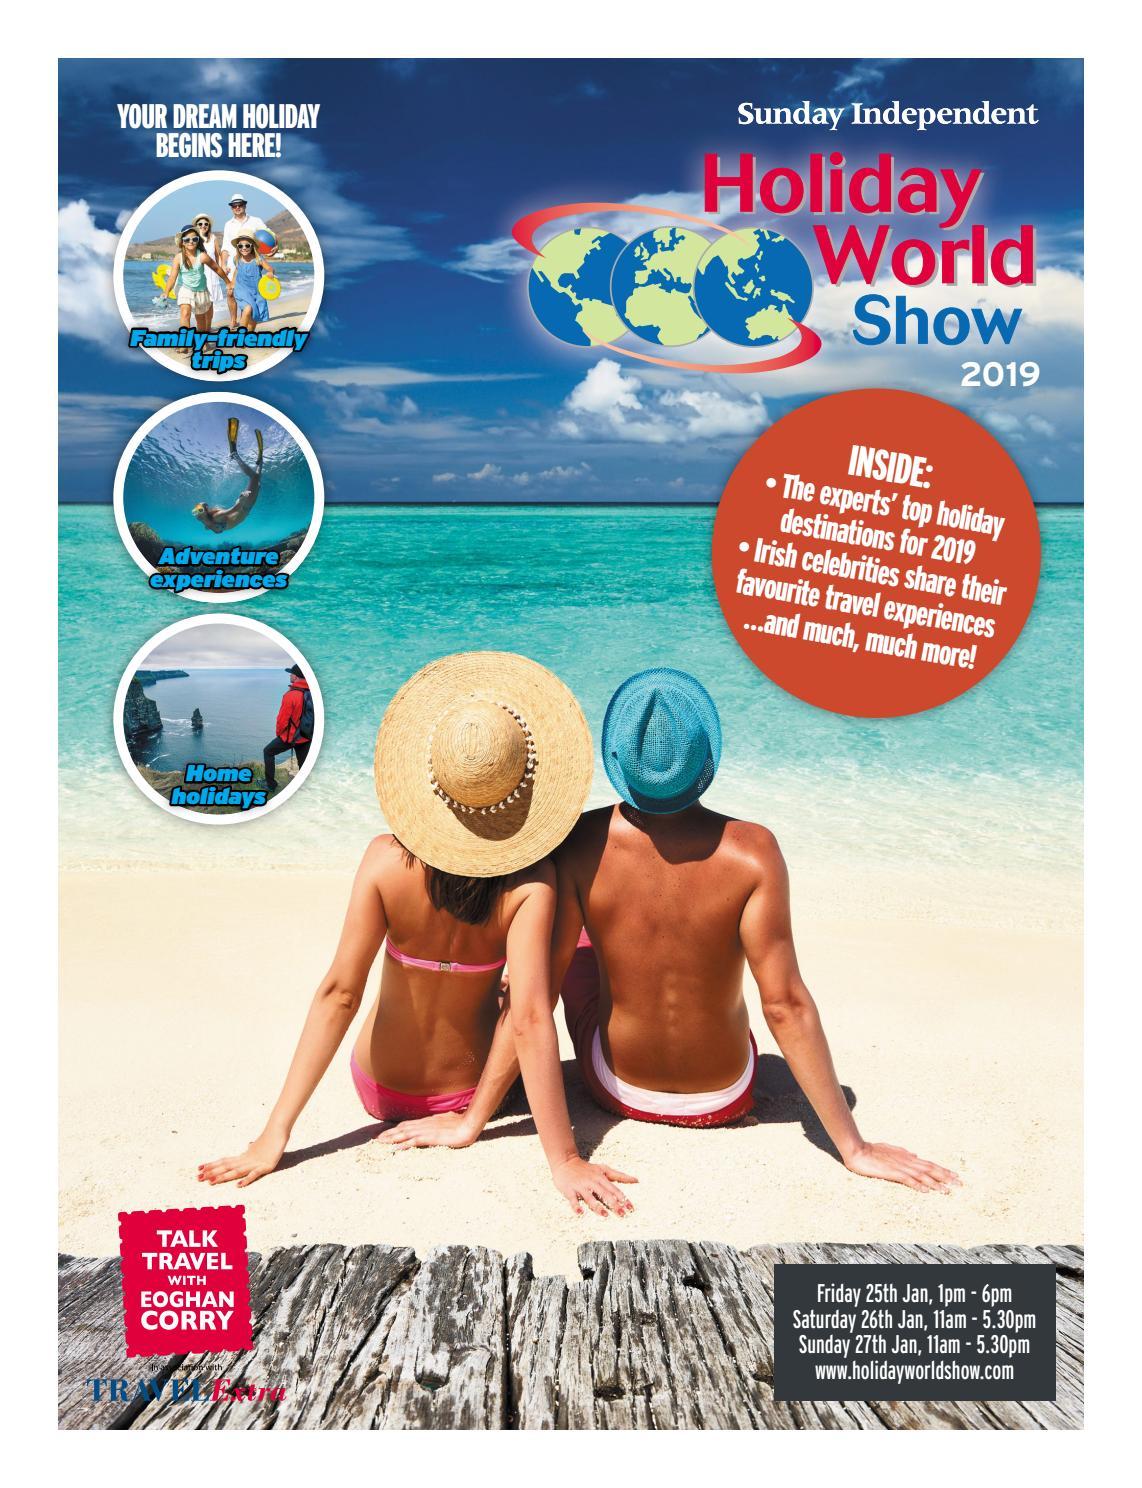 POSTER MAJORCA SPAIN BEACH FUN SAILBOAT SEA SUMMER TRAVEL VINTAGE REPRO FREE S//H